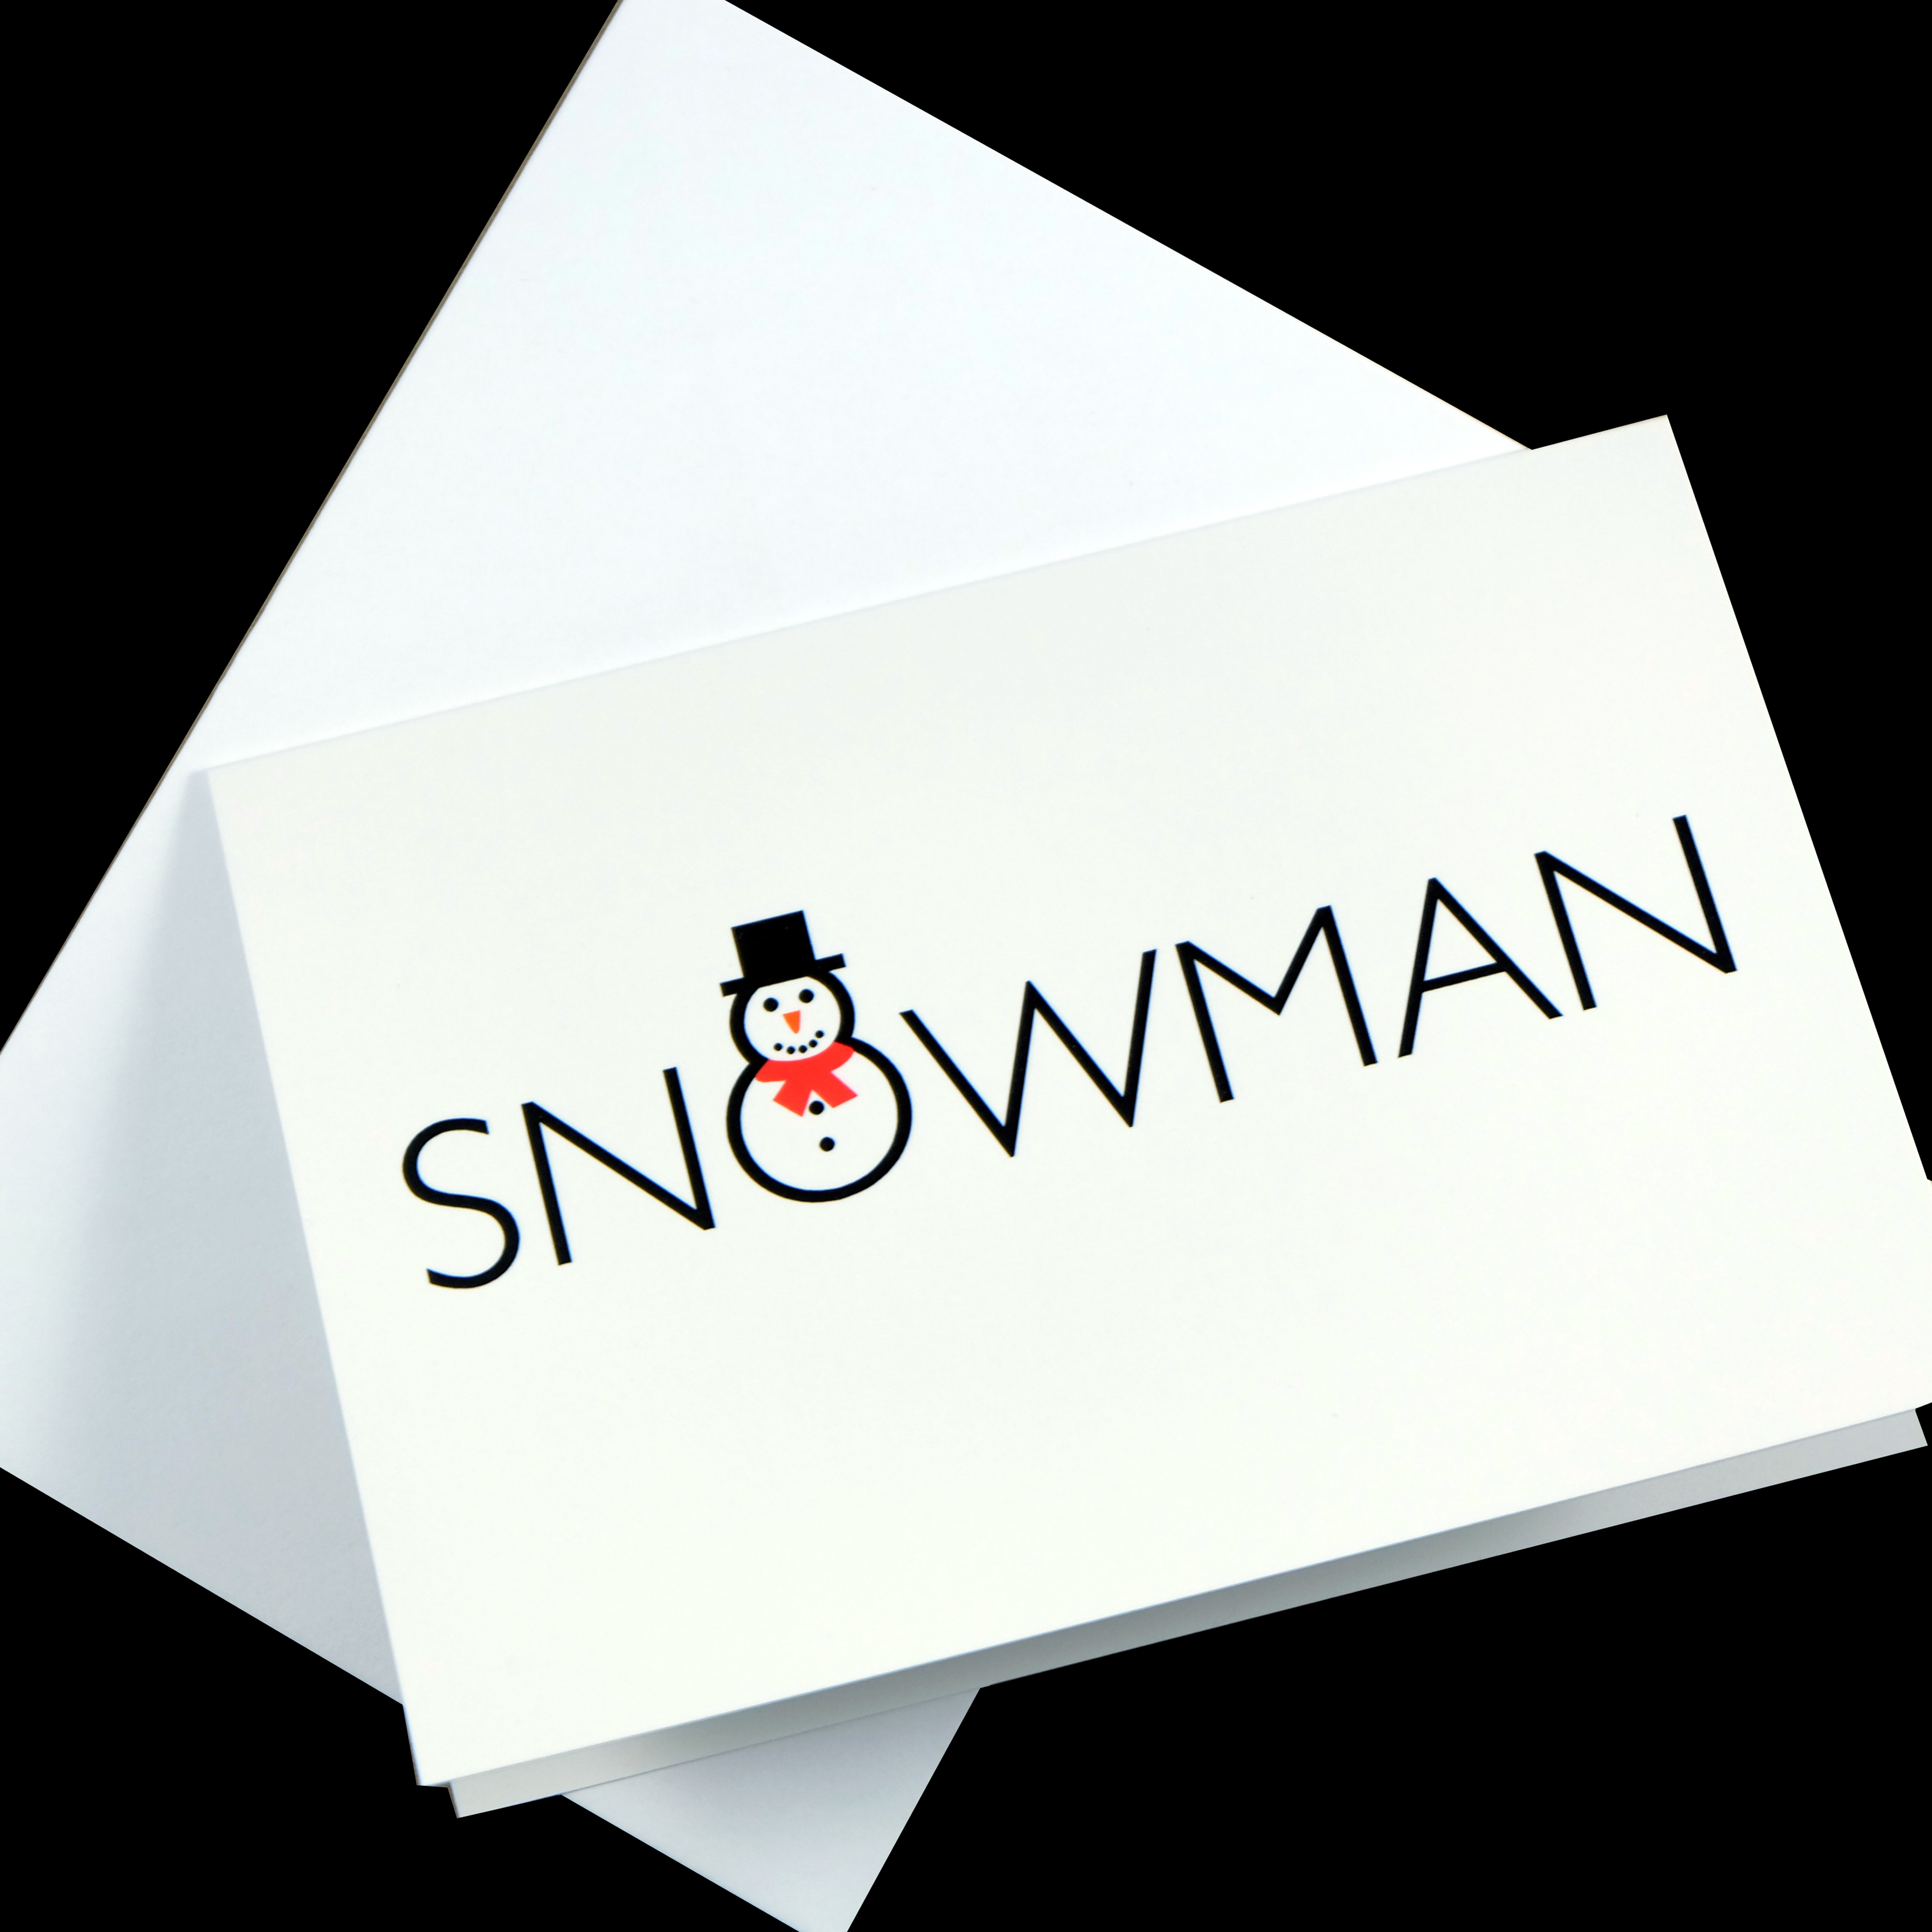 Snowman_artfull_Puffin